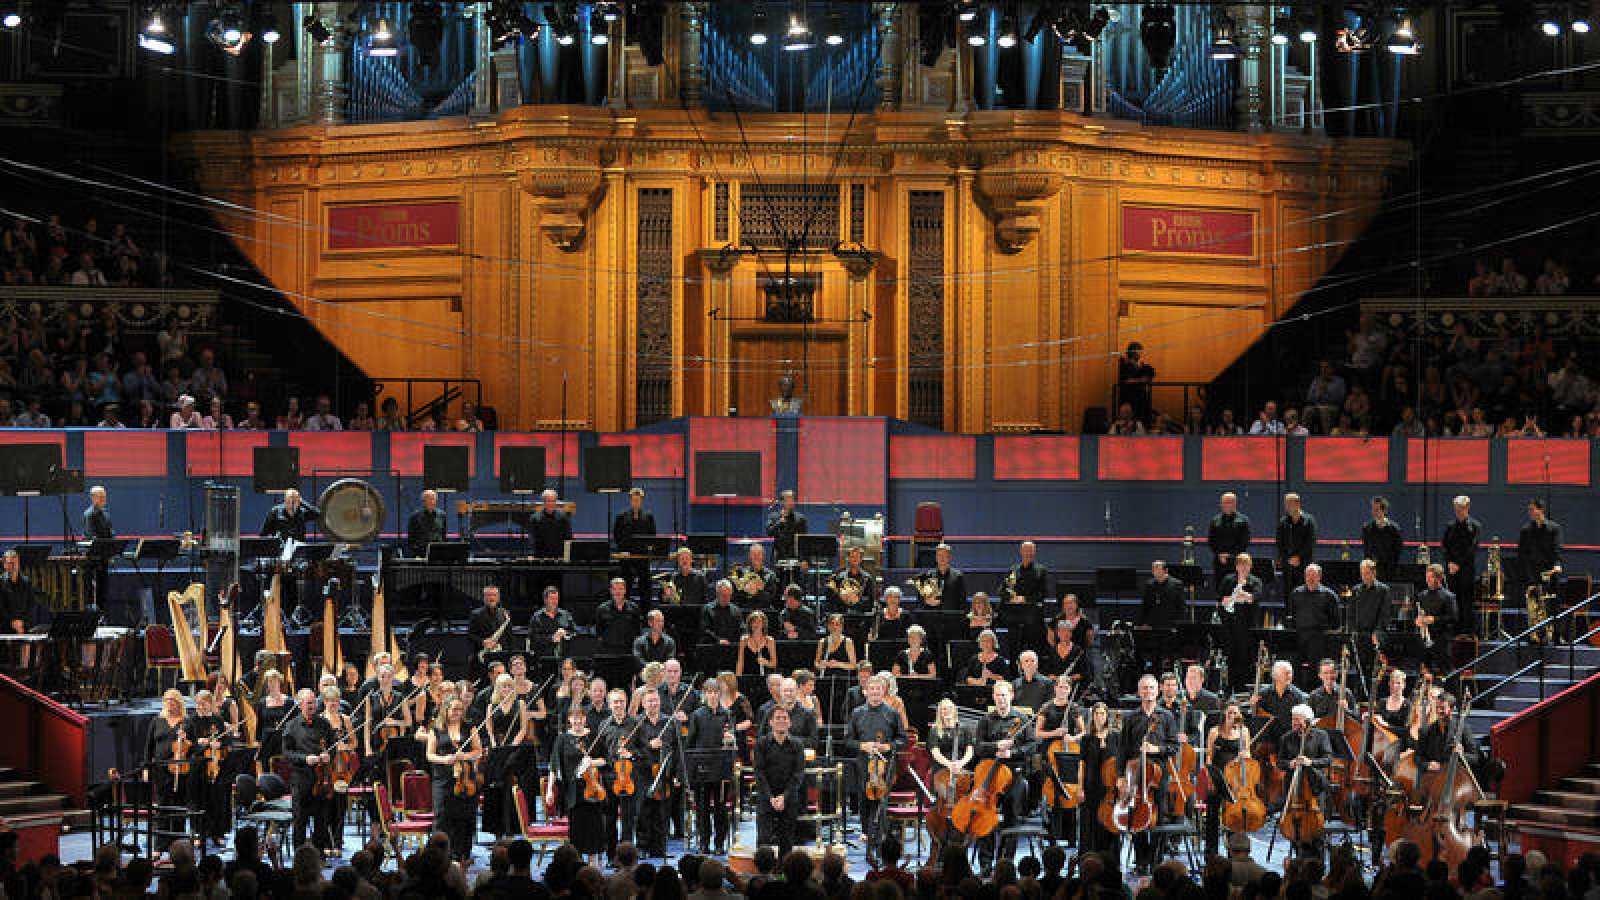 Orquesta Sinfónica de la BBC